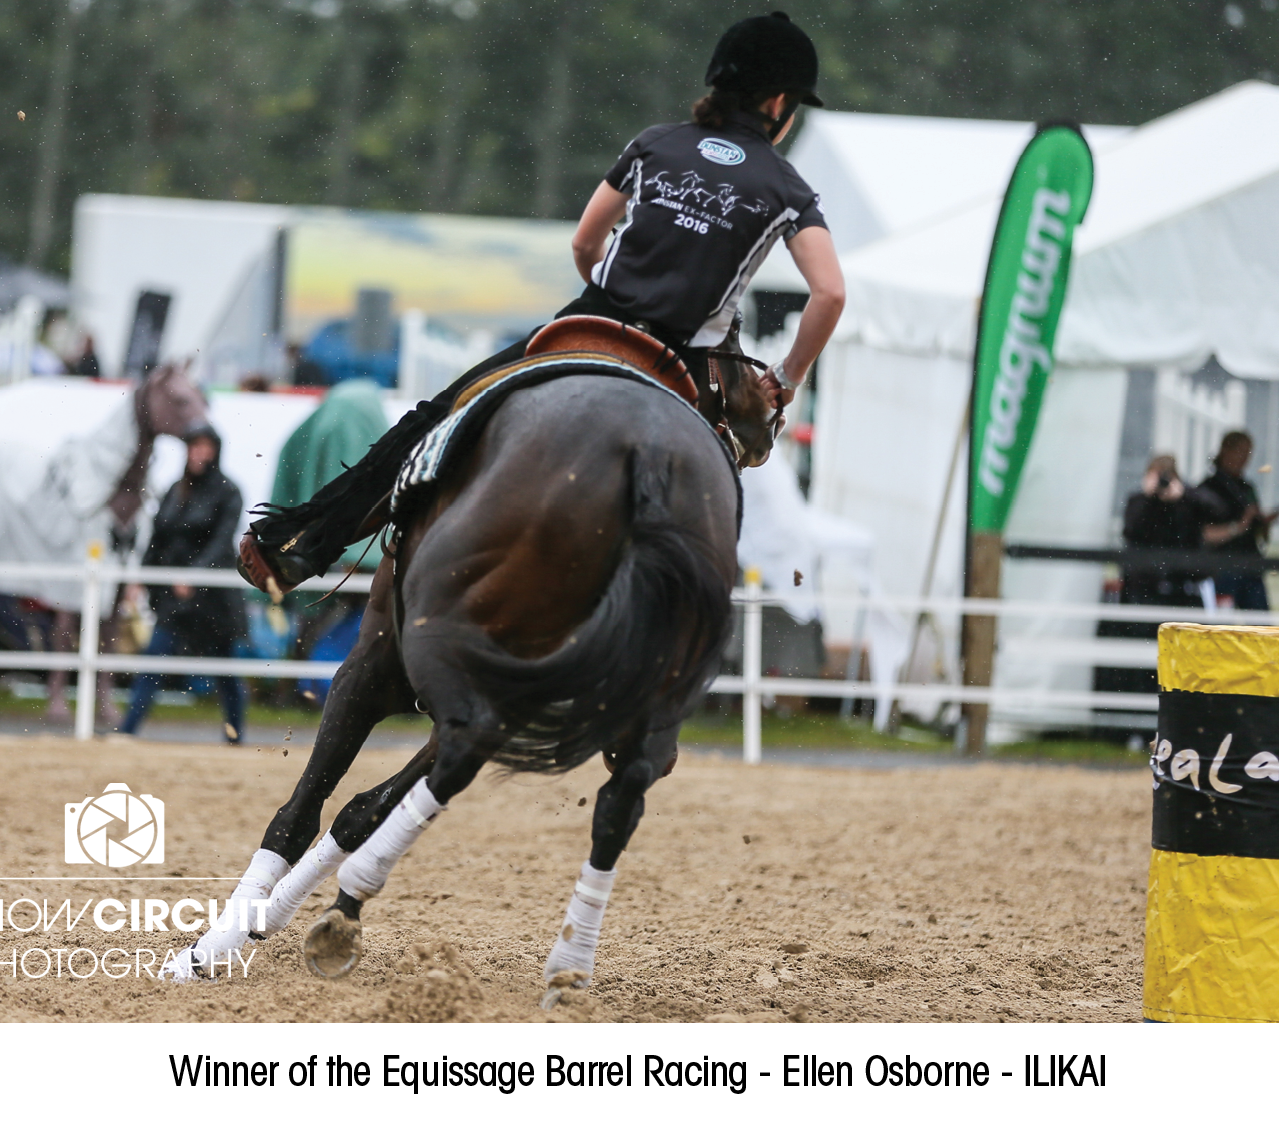 Winner of the Equissage Barrel Racing - Ellen Osborne - ILIKAI